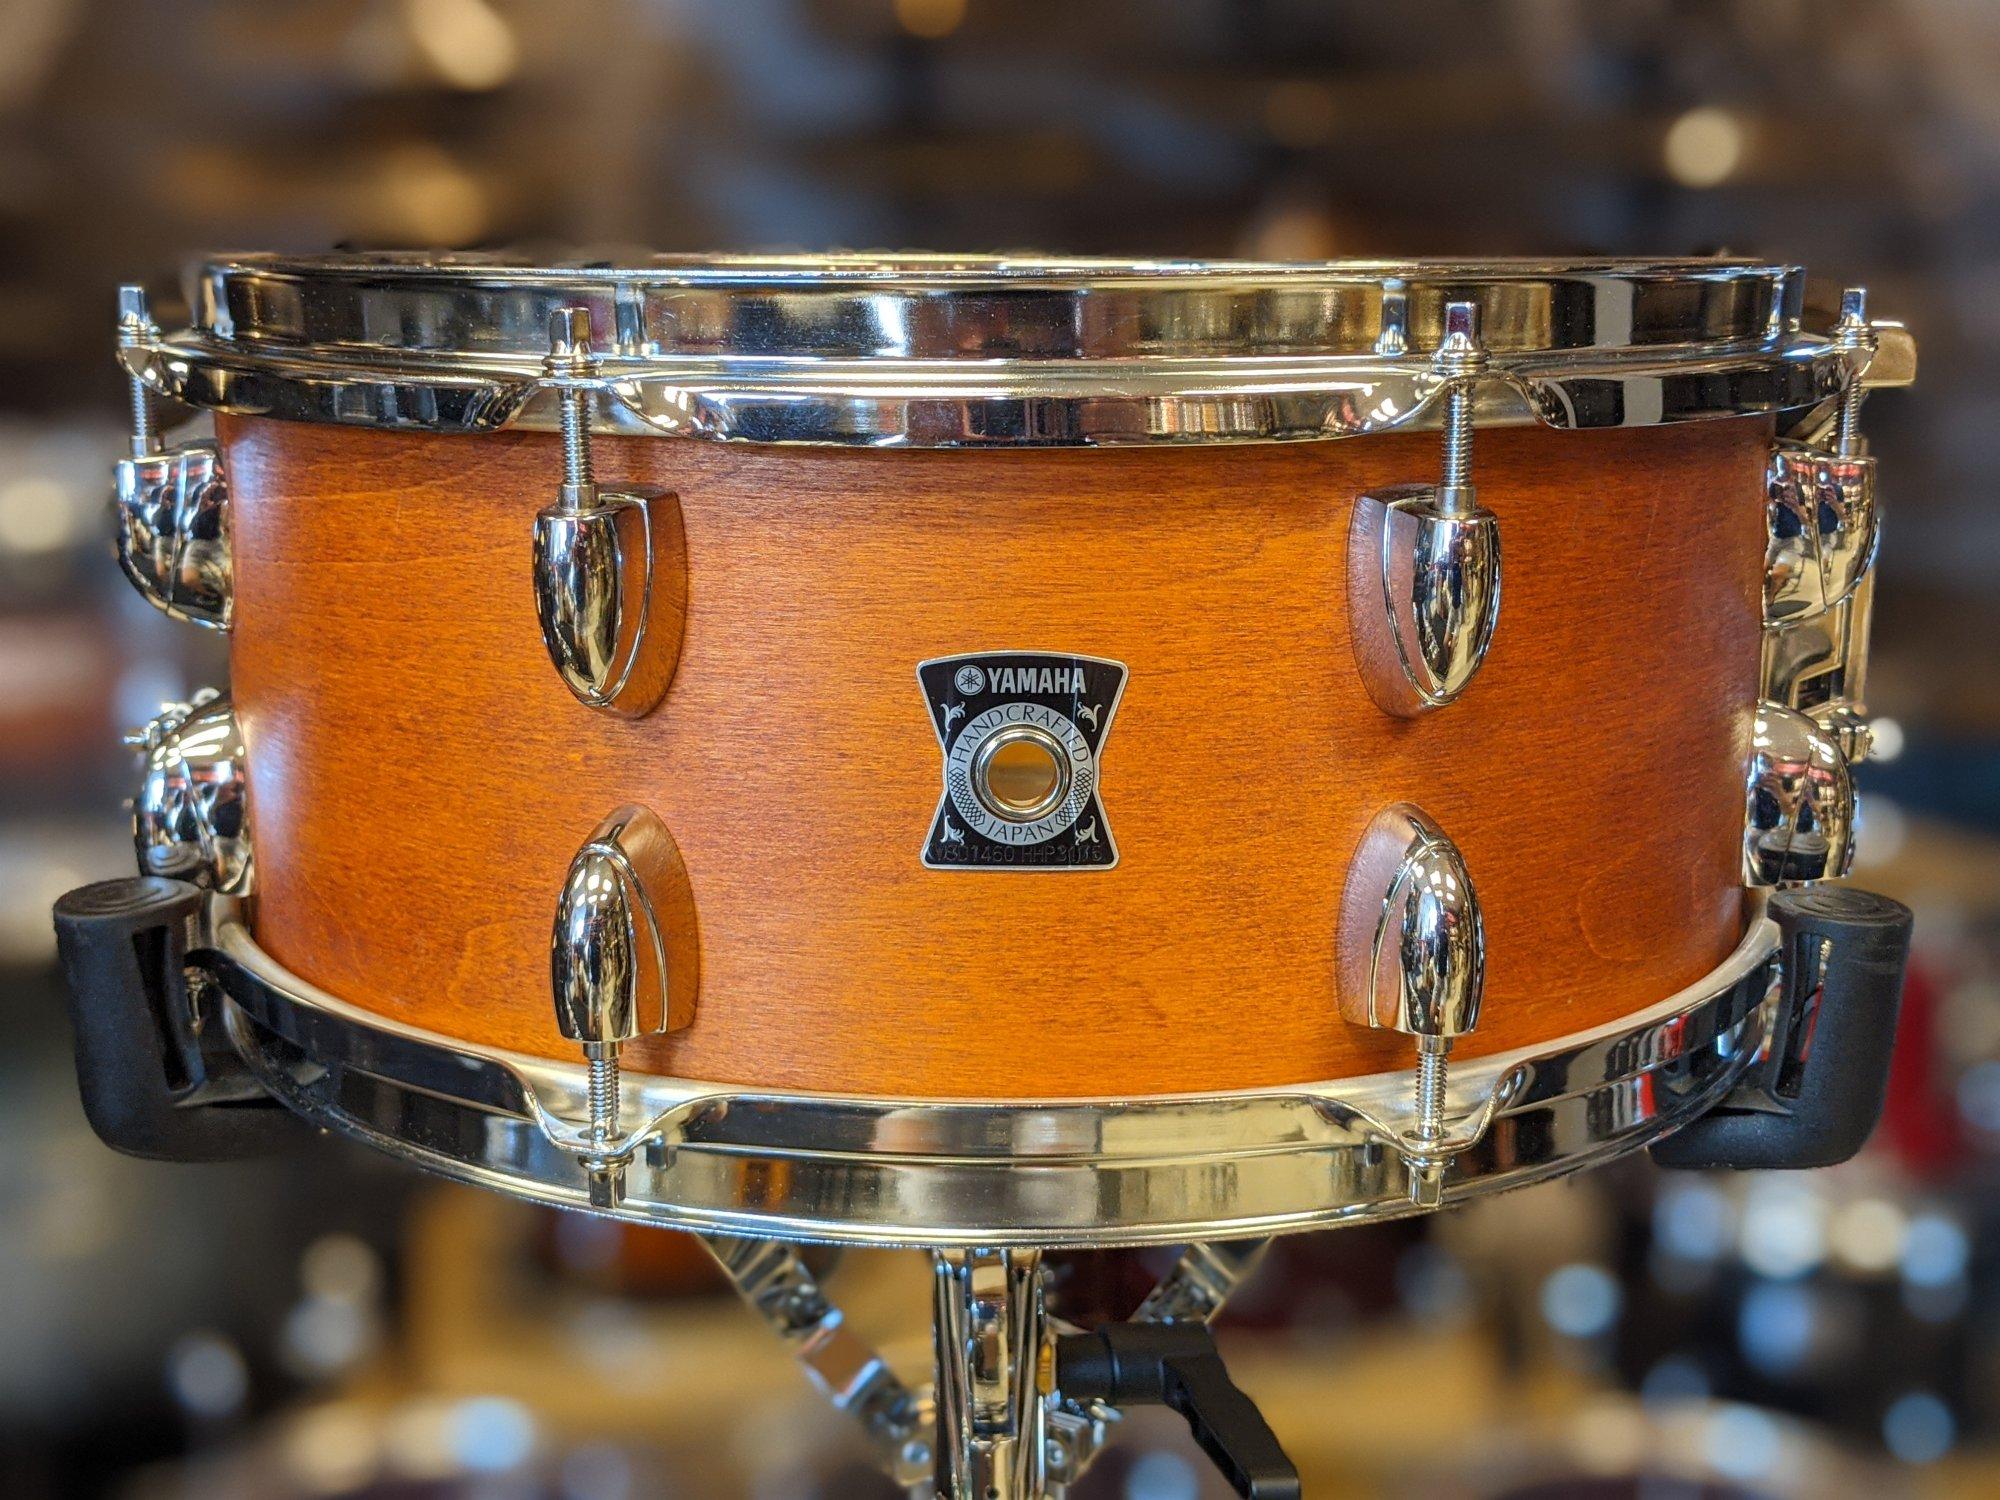 Yamaha Vintage Series Maple Snare Drum 6 x 14